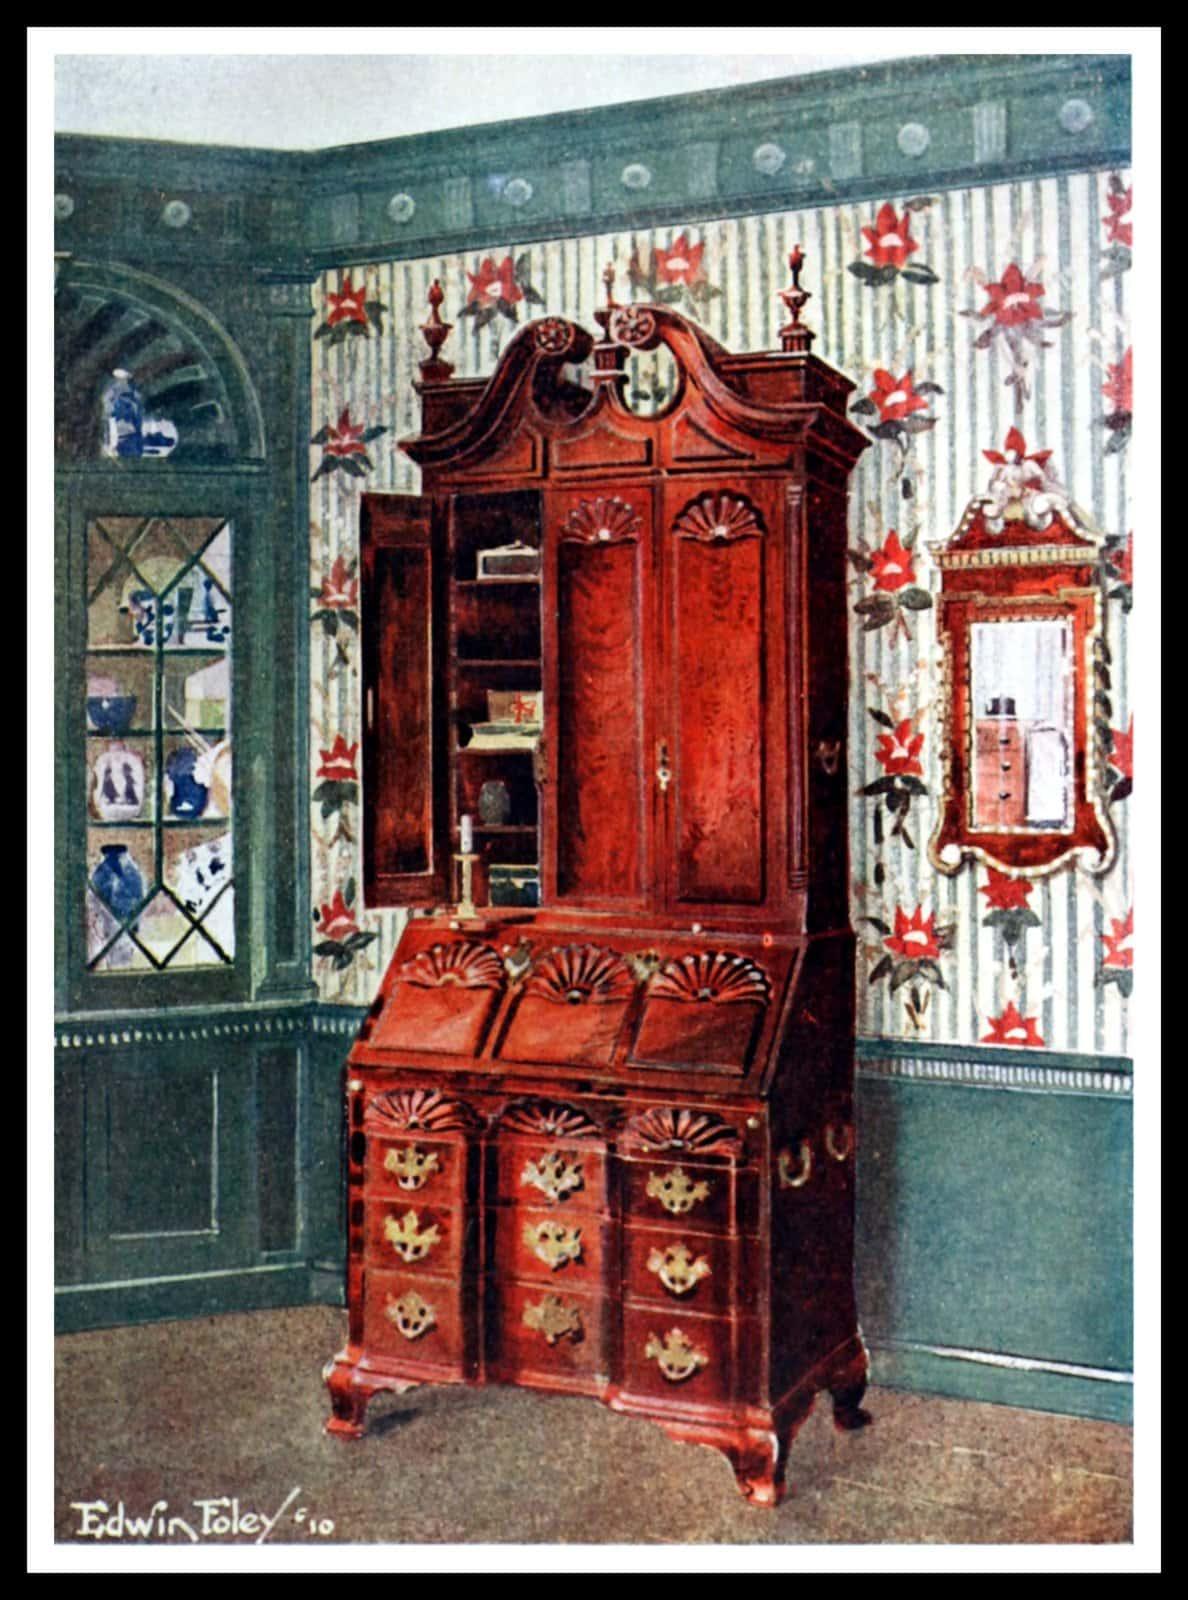 Mahogany cabinet-topped secretary writing desk - Providence, Maryland (1775)